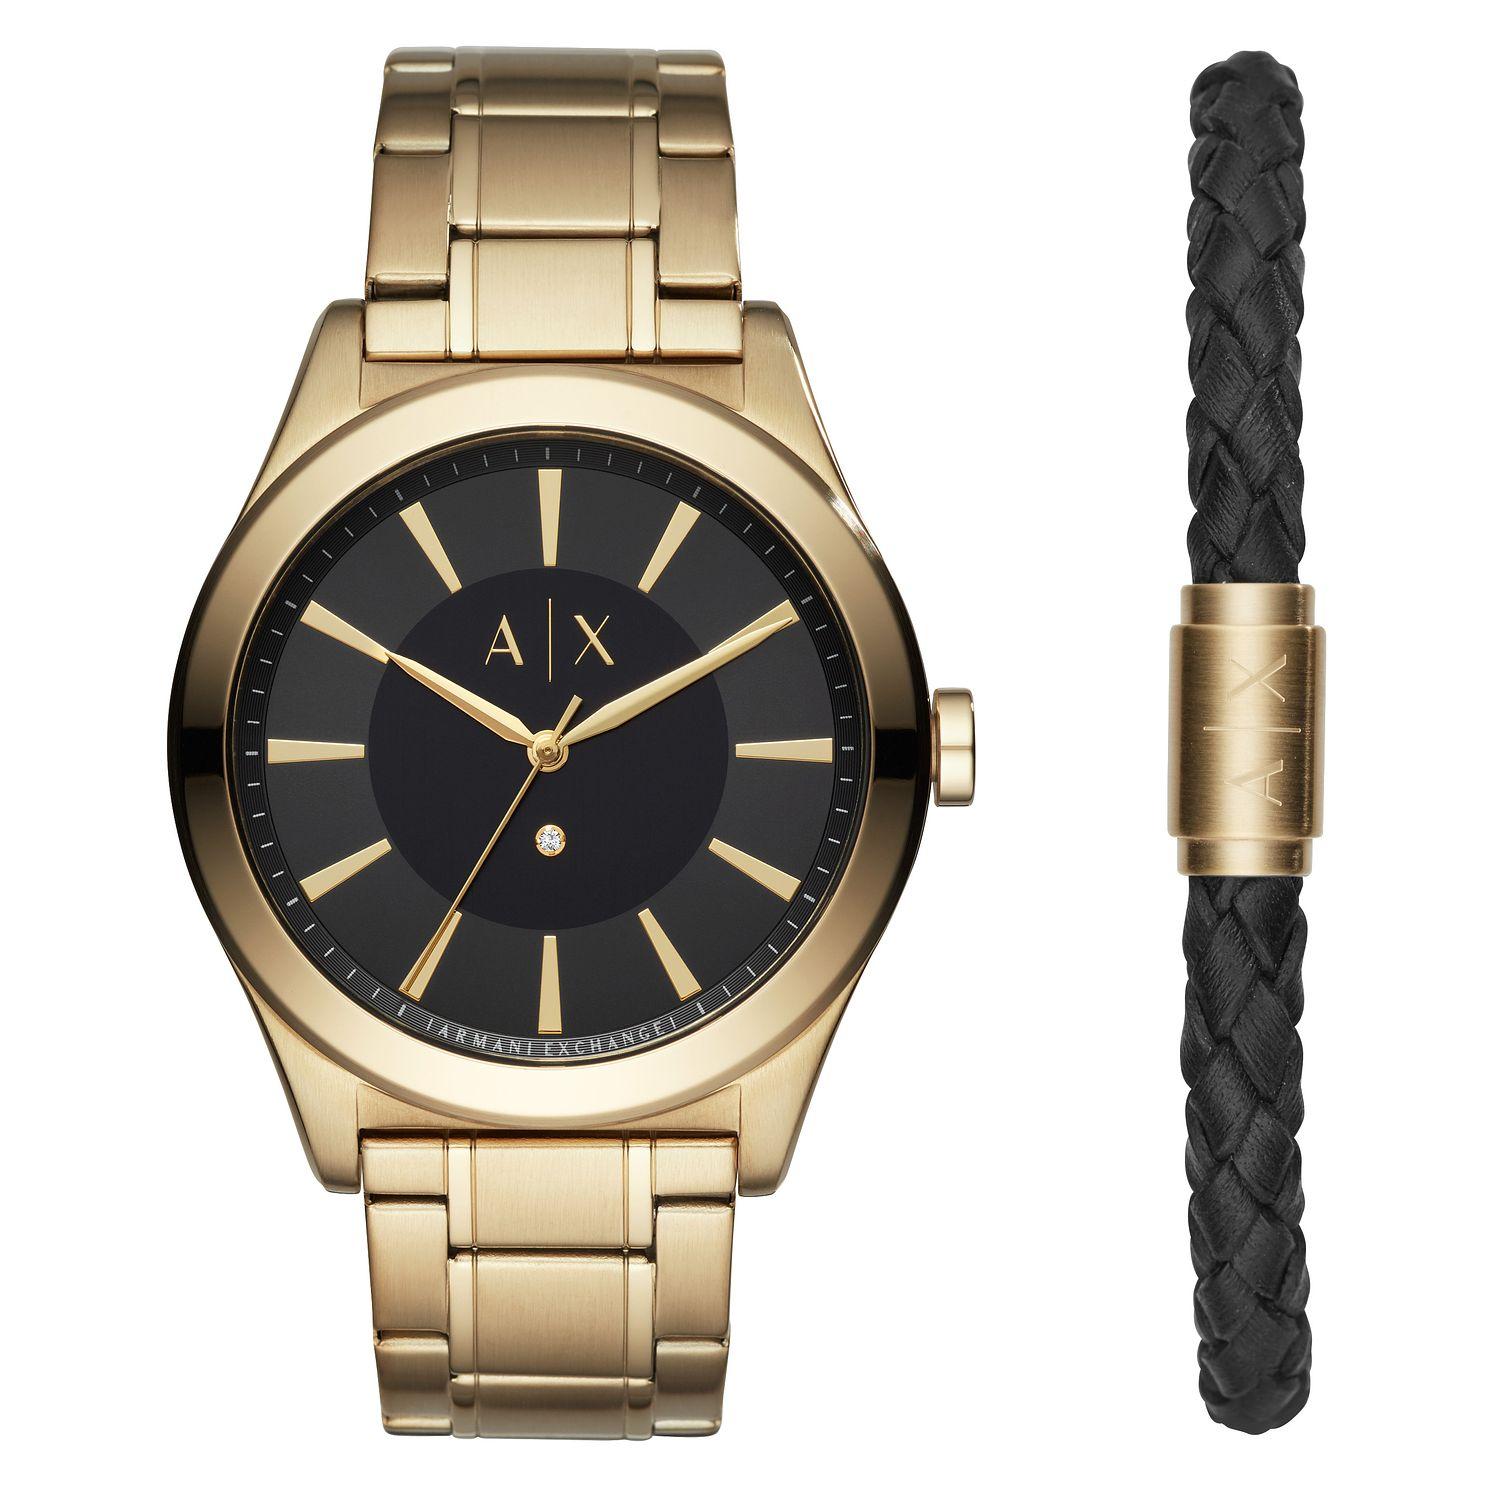 928a51c9 Armani Exchange Men's Gold Plated Watch & Bracelet Set